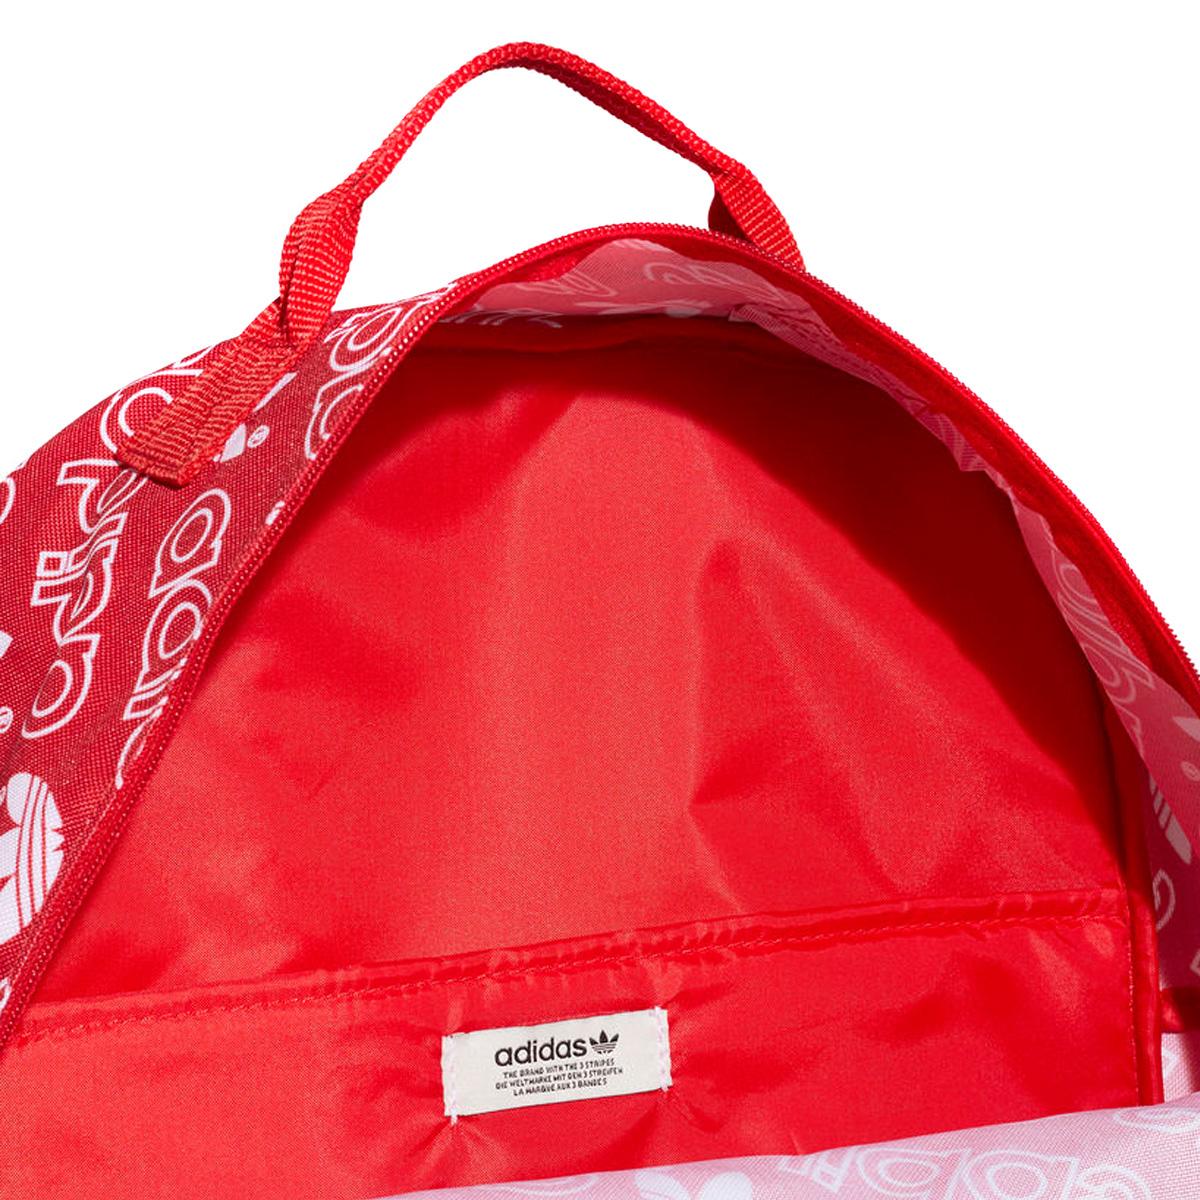 ee3fa6166688 Red Adidas Originals Backpack- Fenix Toulouse Handball